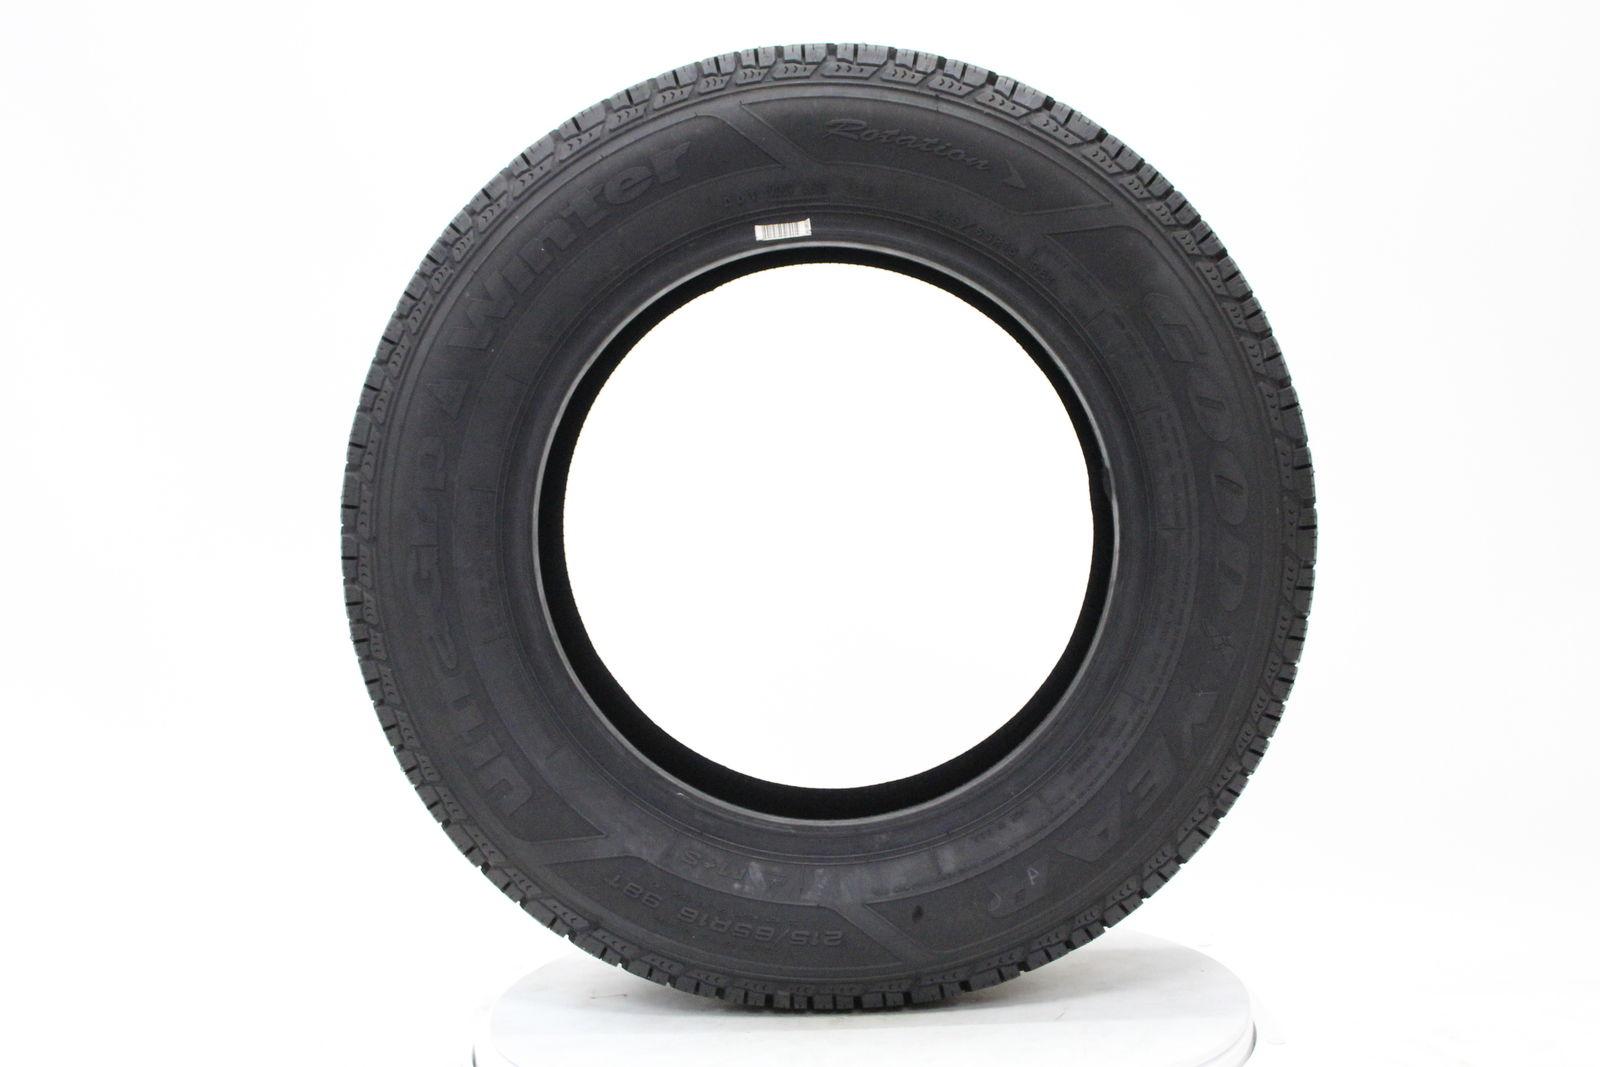 1 New Goodyear Ultra Grip Winter Tire - 195/60R15 - Winter ...